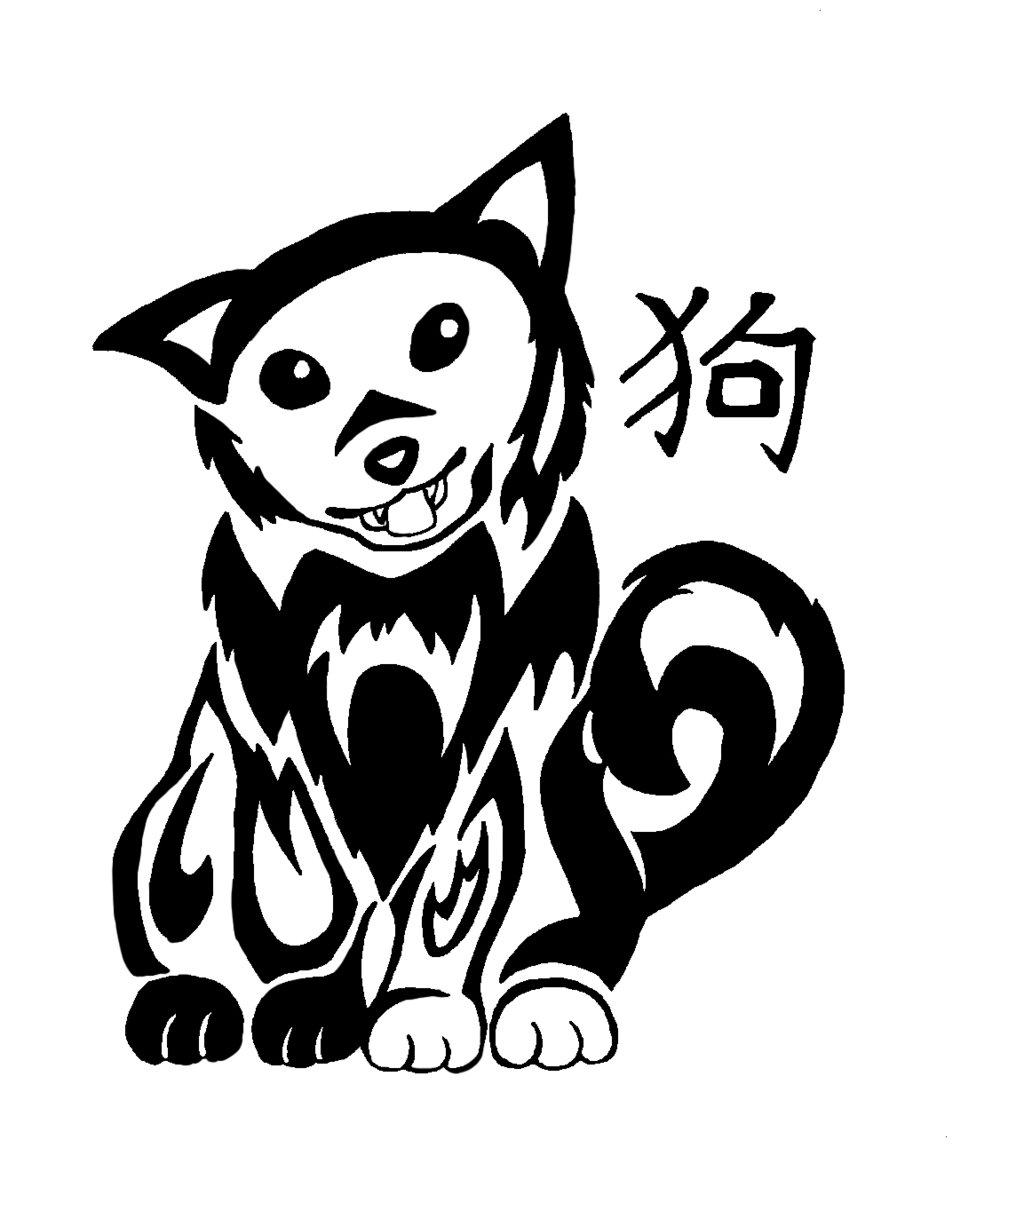 Drawn pug tribal Zodiac dog  Dog Tribal